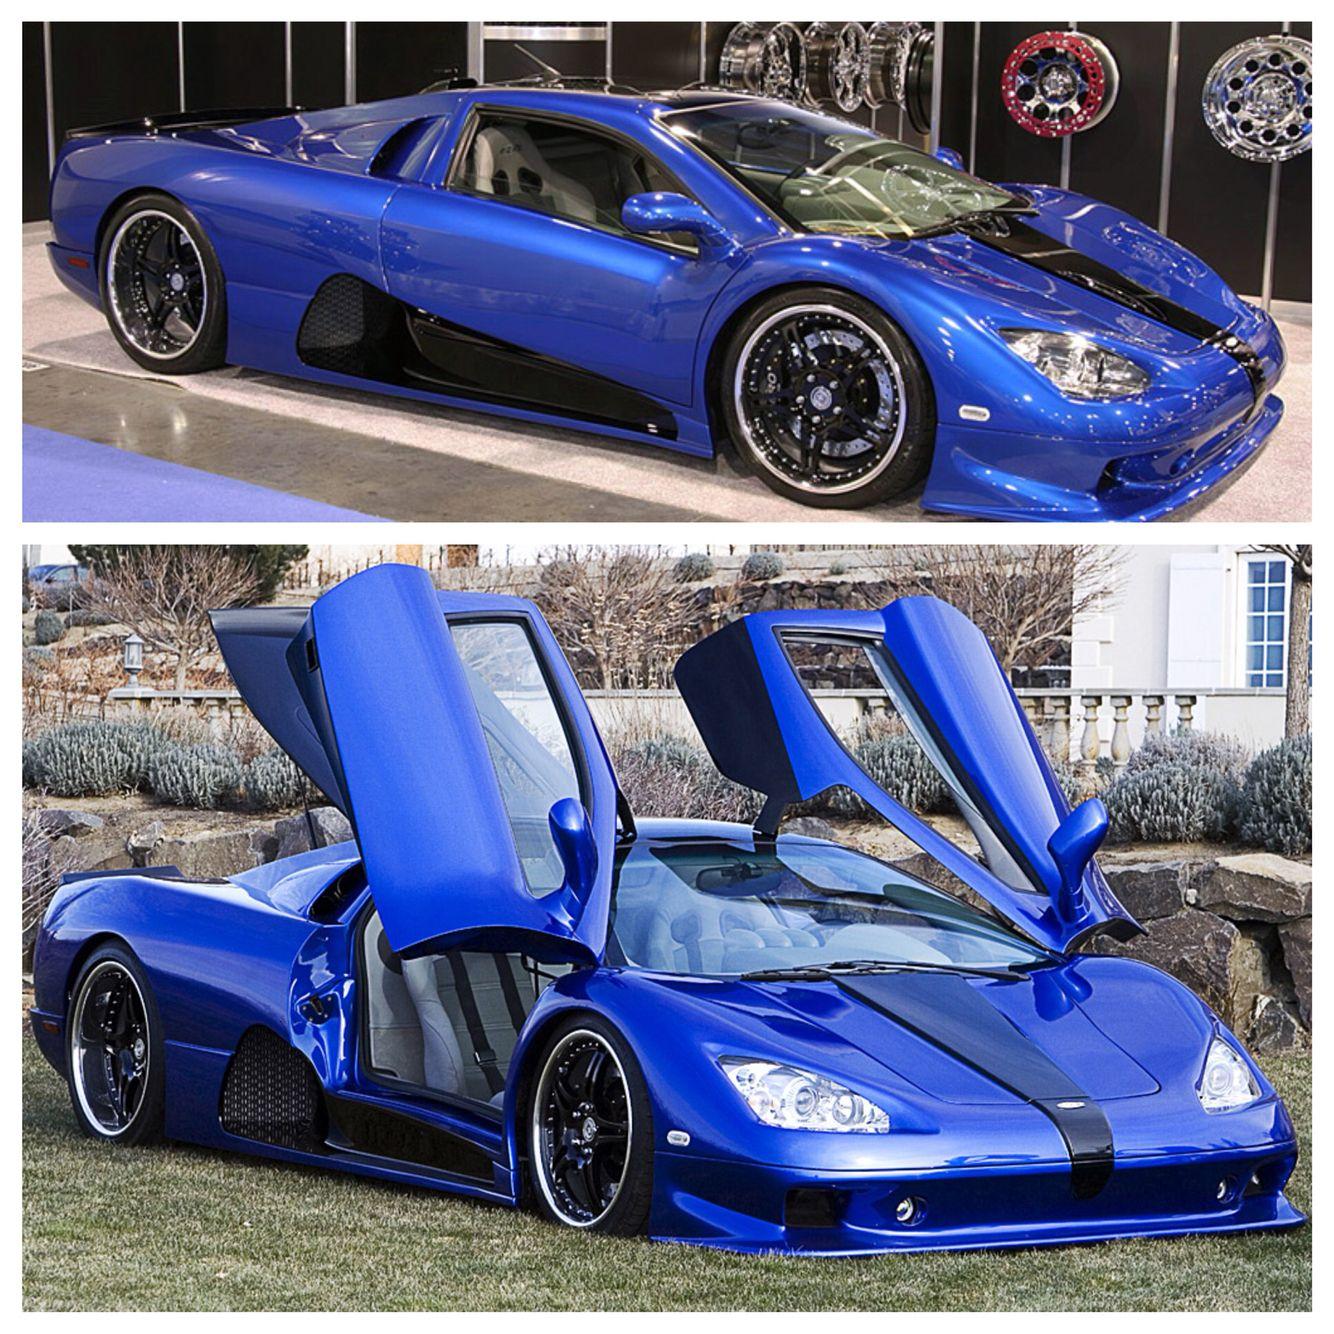 Scc Ultimate Aero Manufacturer Shelby Supercars Engine 6 34 Litre 387 2 Cu In V8 Speed Over 270 Mph 430 Km H Super Cars Bmw Go Car